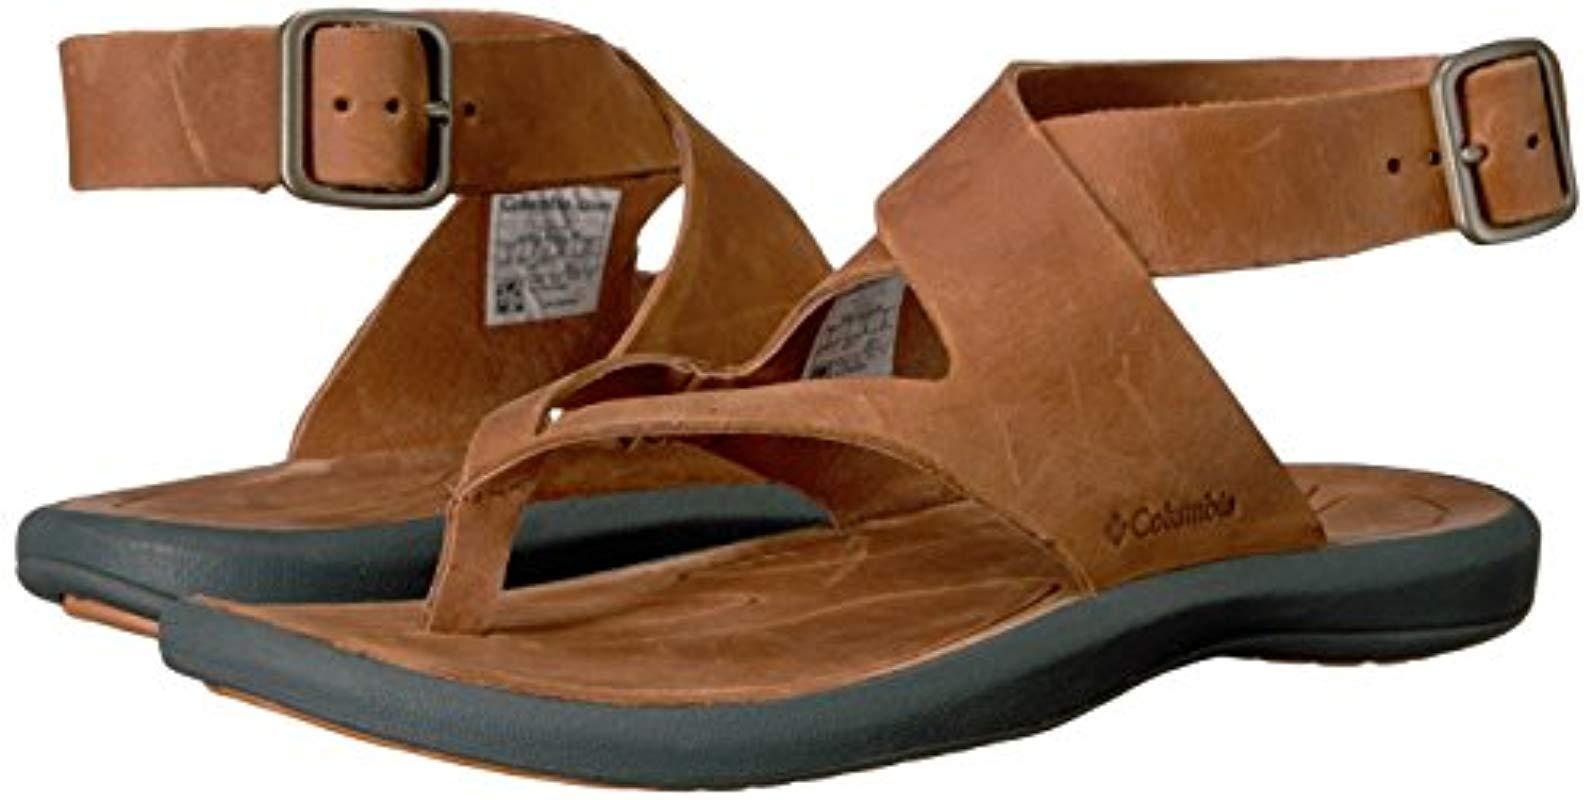 Columbia Leather Caprizee Sandal Nubuck